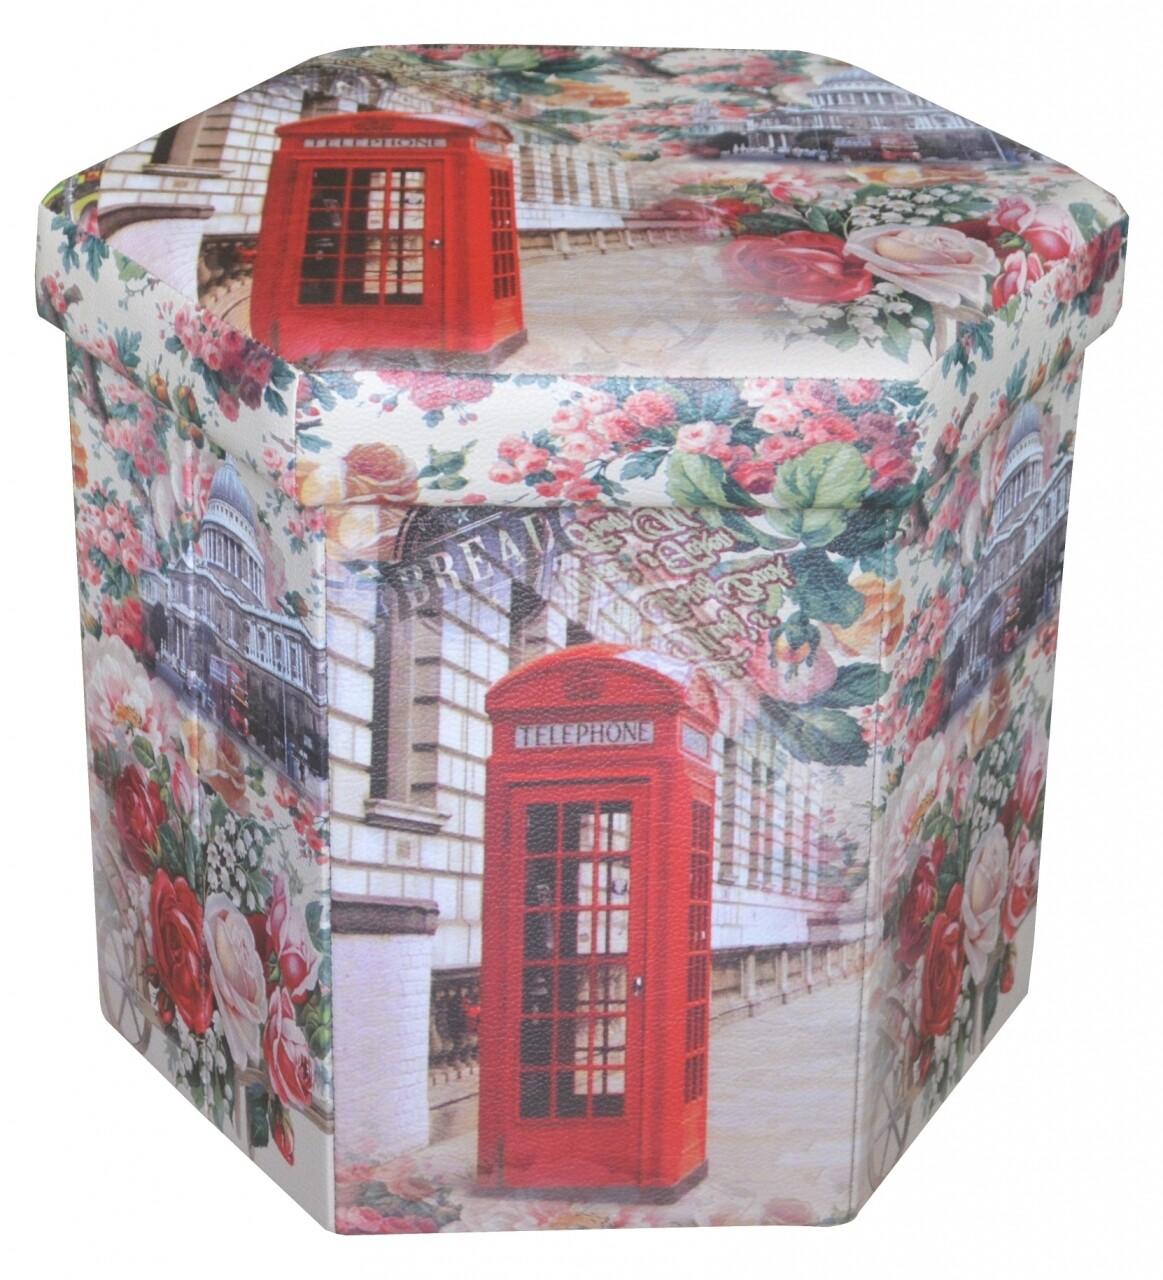 Taburet pliabil cu spatiu de depozitare Hexagonal Phone, Heinner Home, 43 x 38 x 38 cm, PVC, multicolor